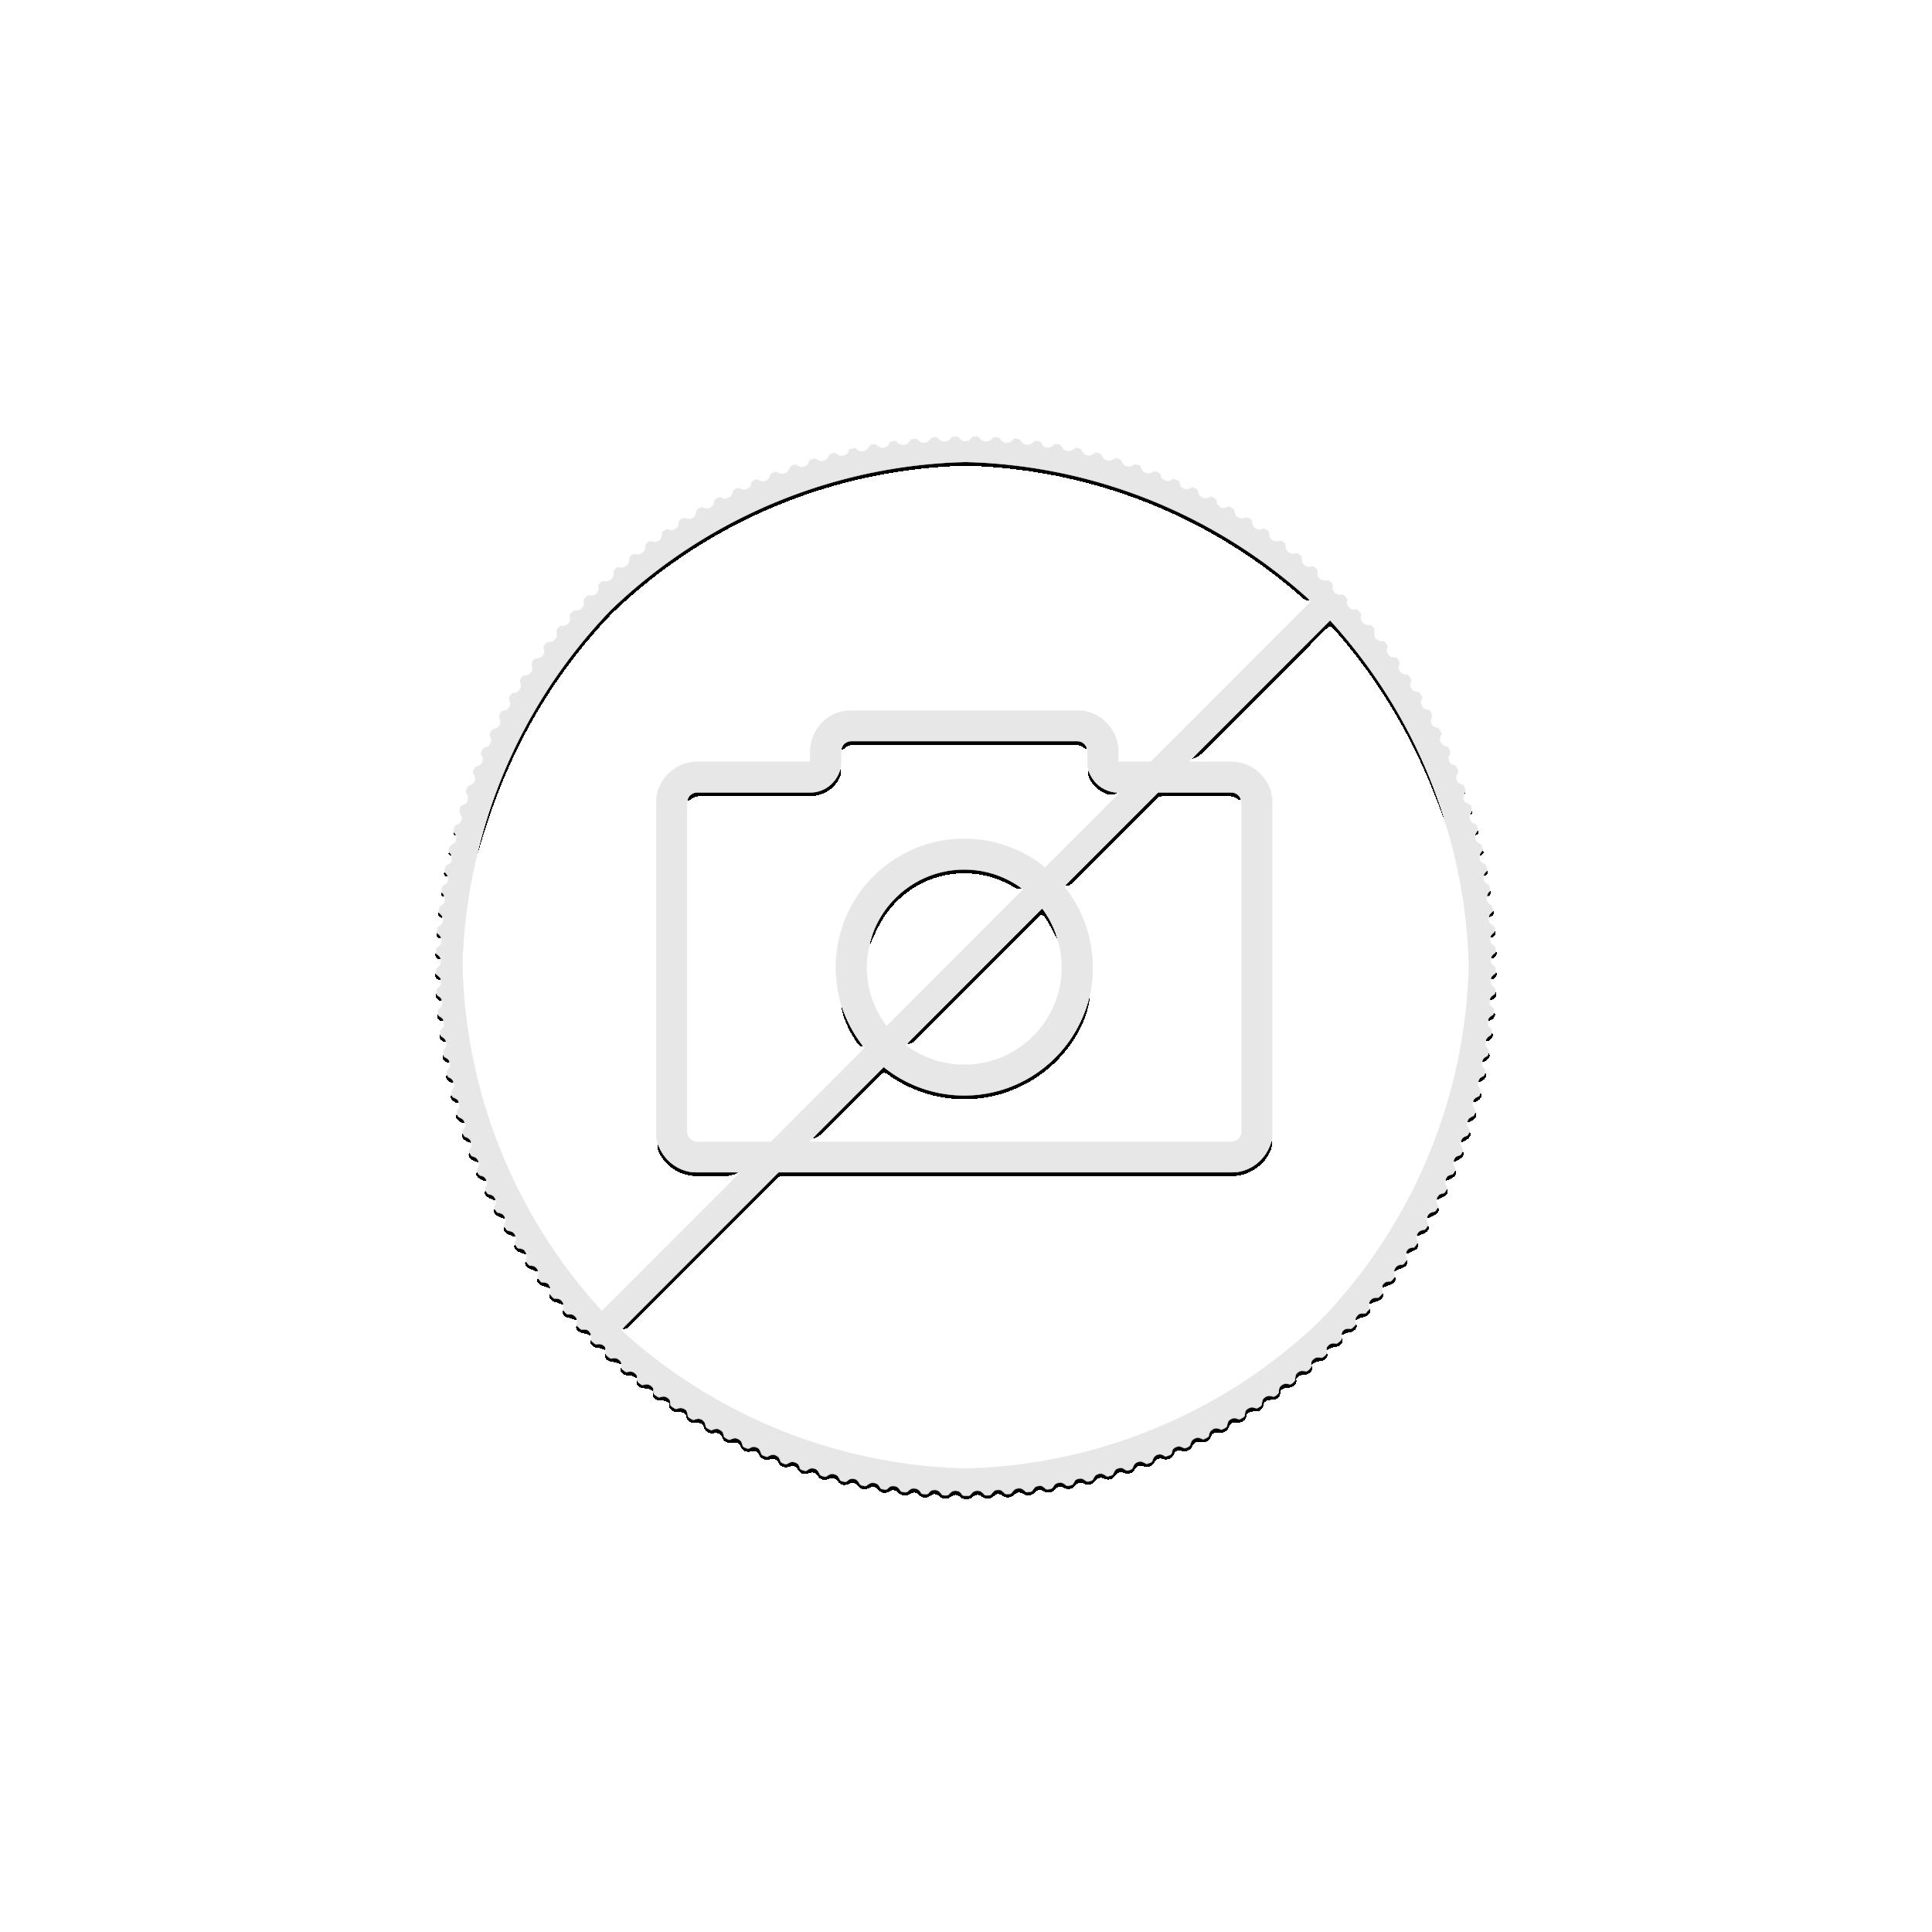 500 Gram zilverbaar diverse producenten